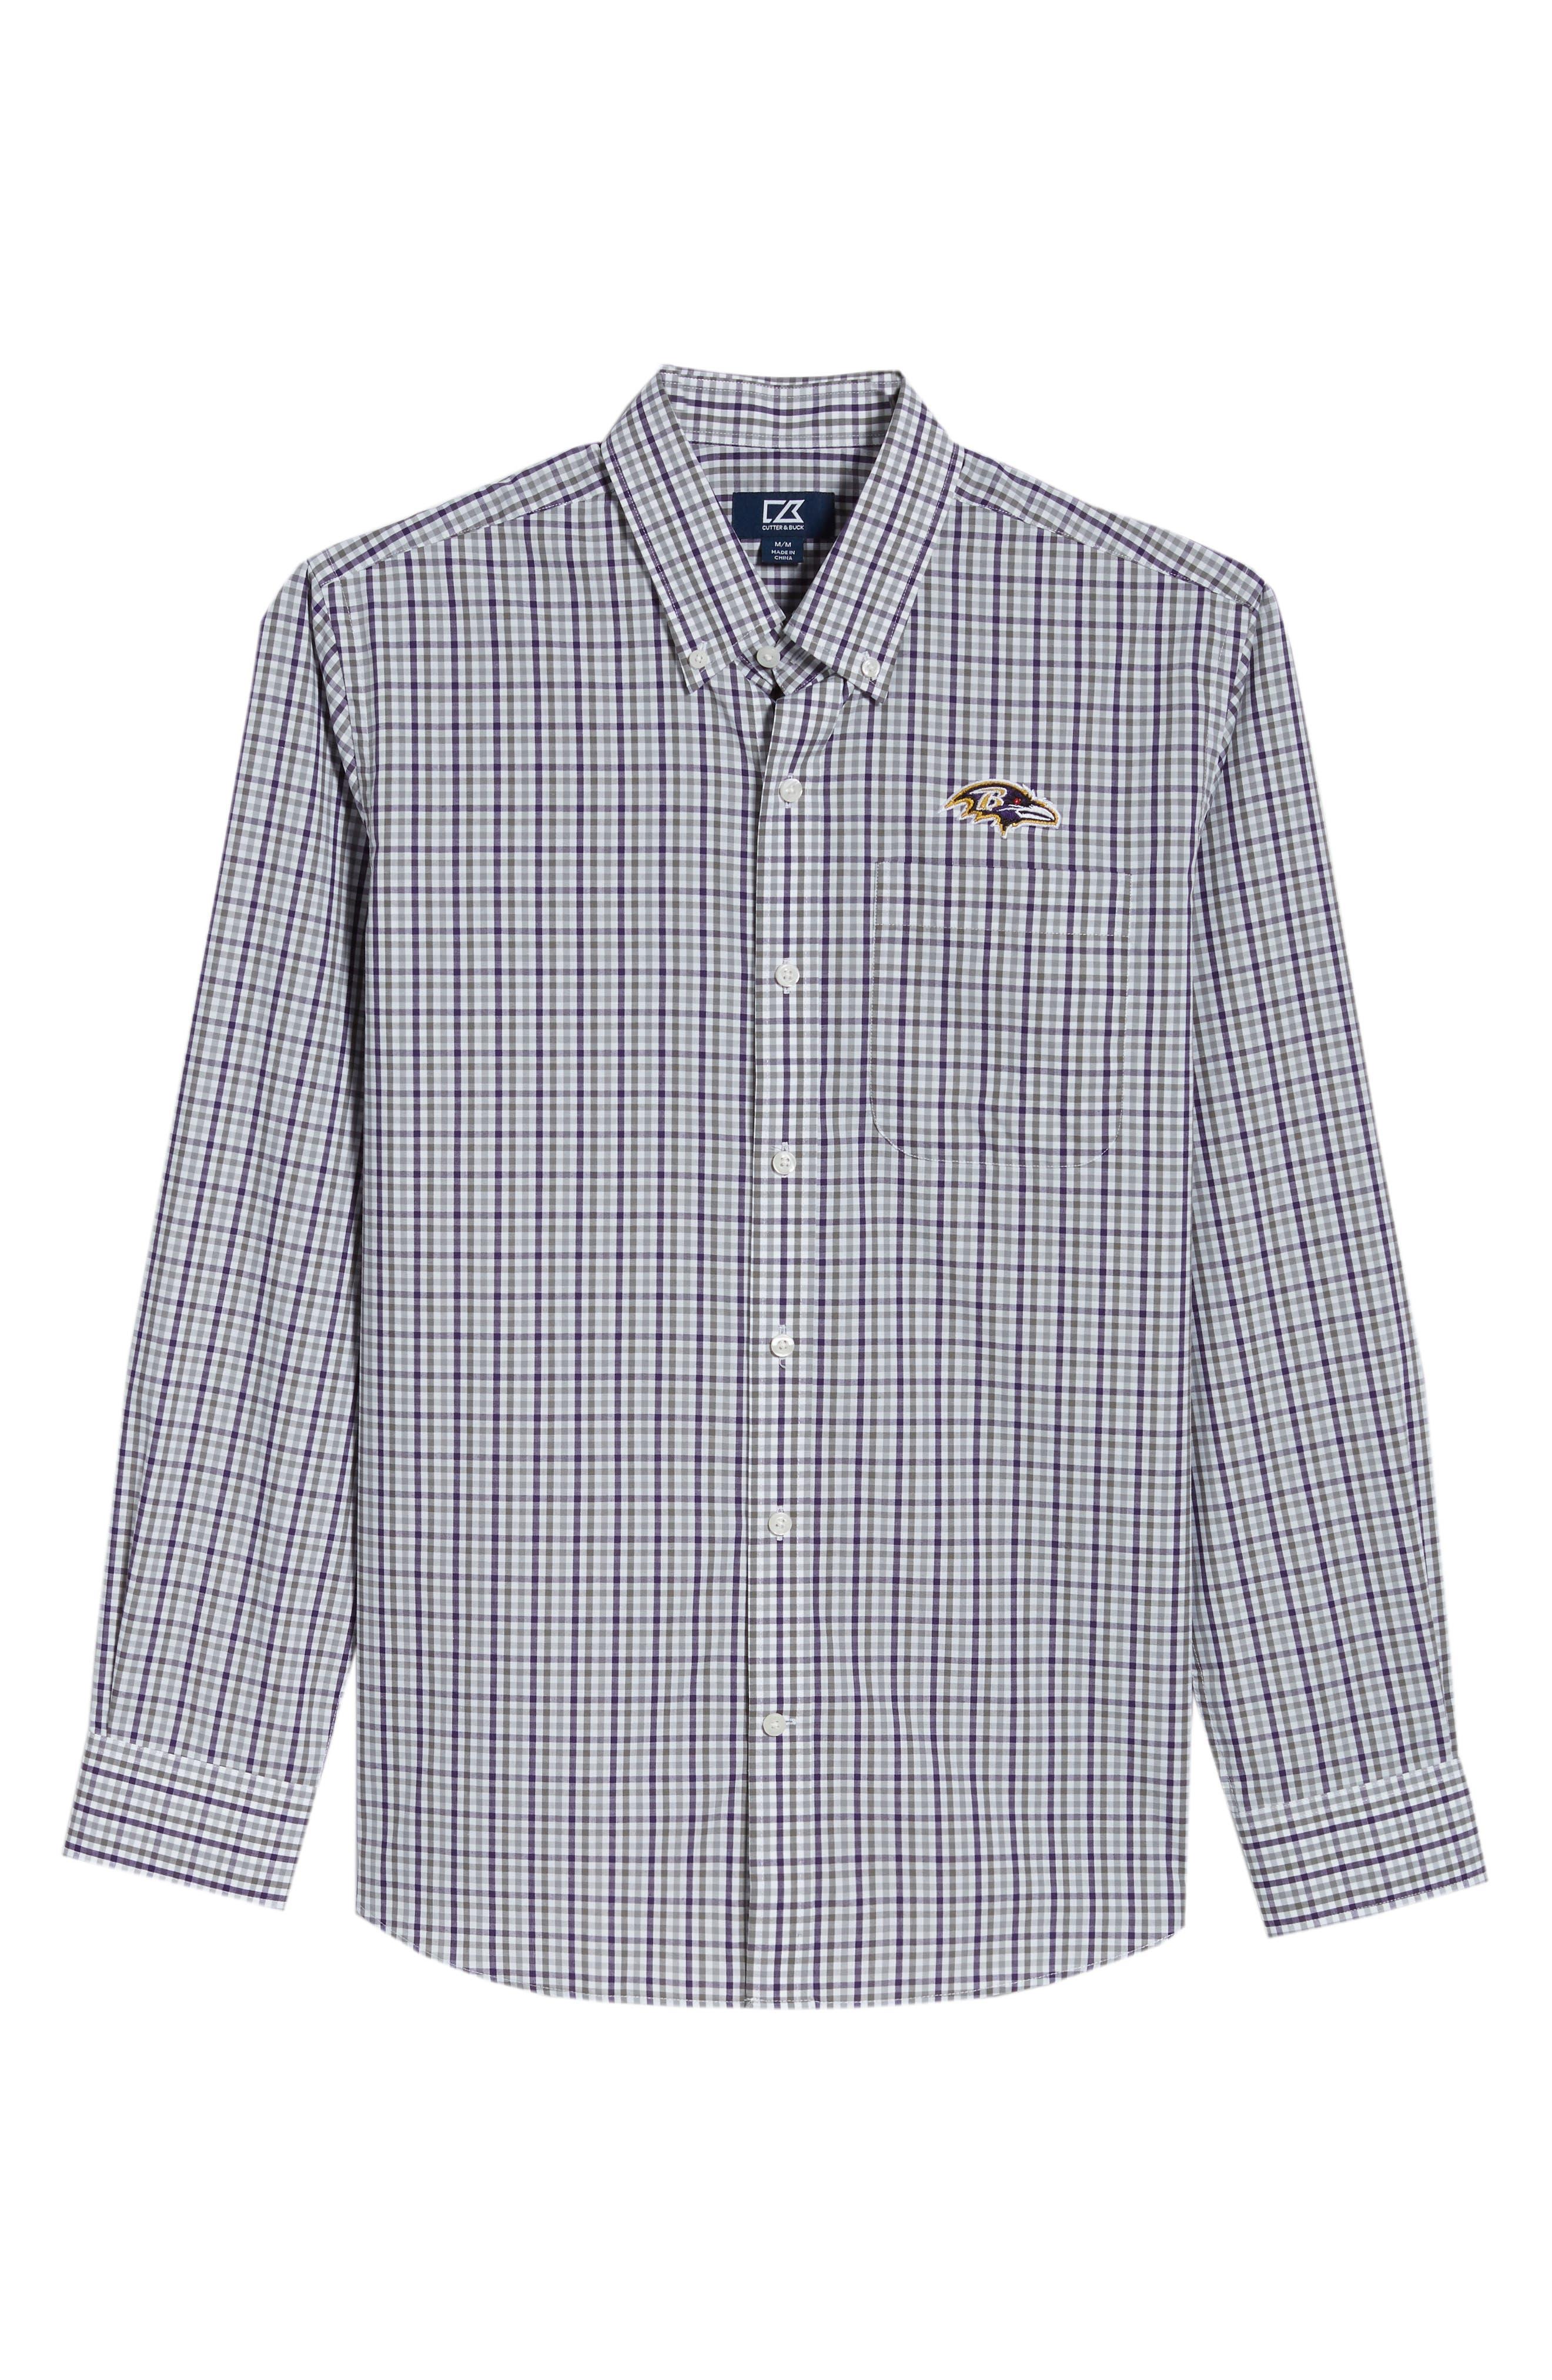 Baltimore Ravens - Gilman Regular Fit Plaid Sport Shirt,                             Alternate thumbnail 6, color,                             541